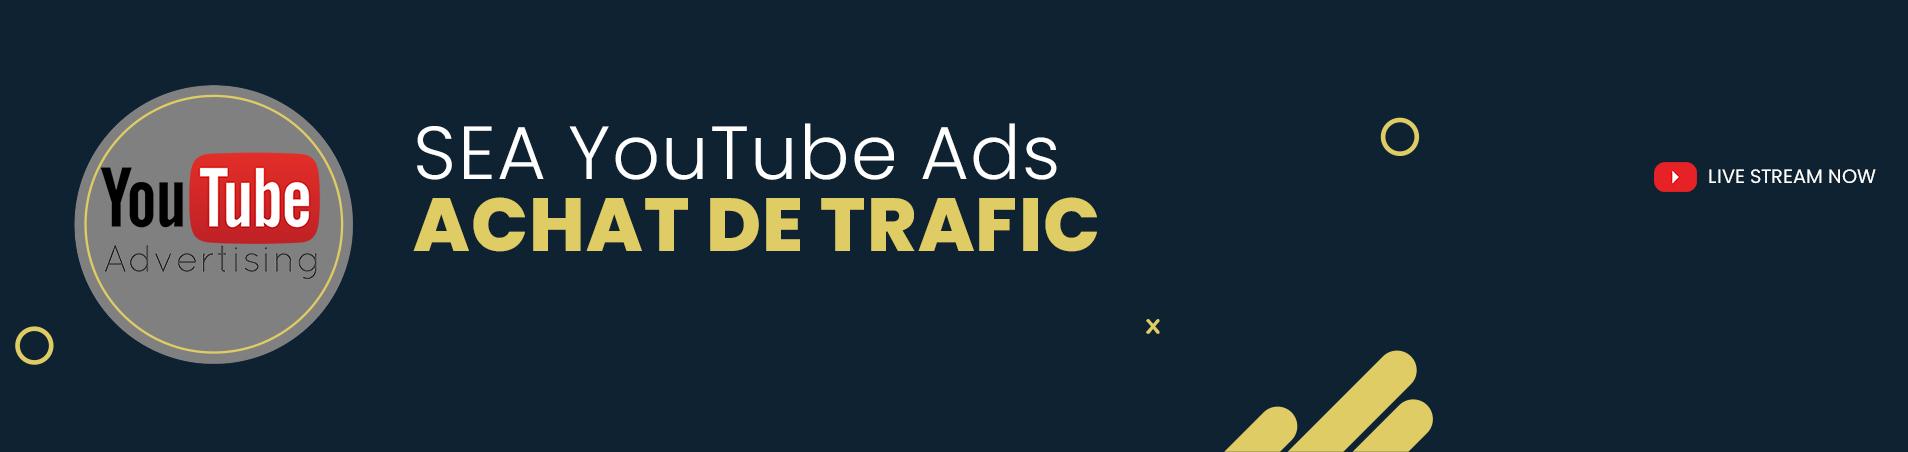 YouTube Ads Achat de trafic